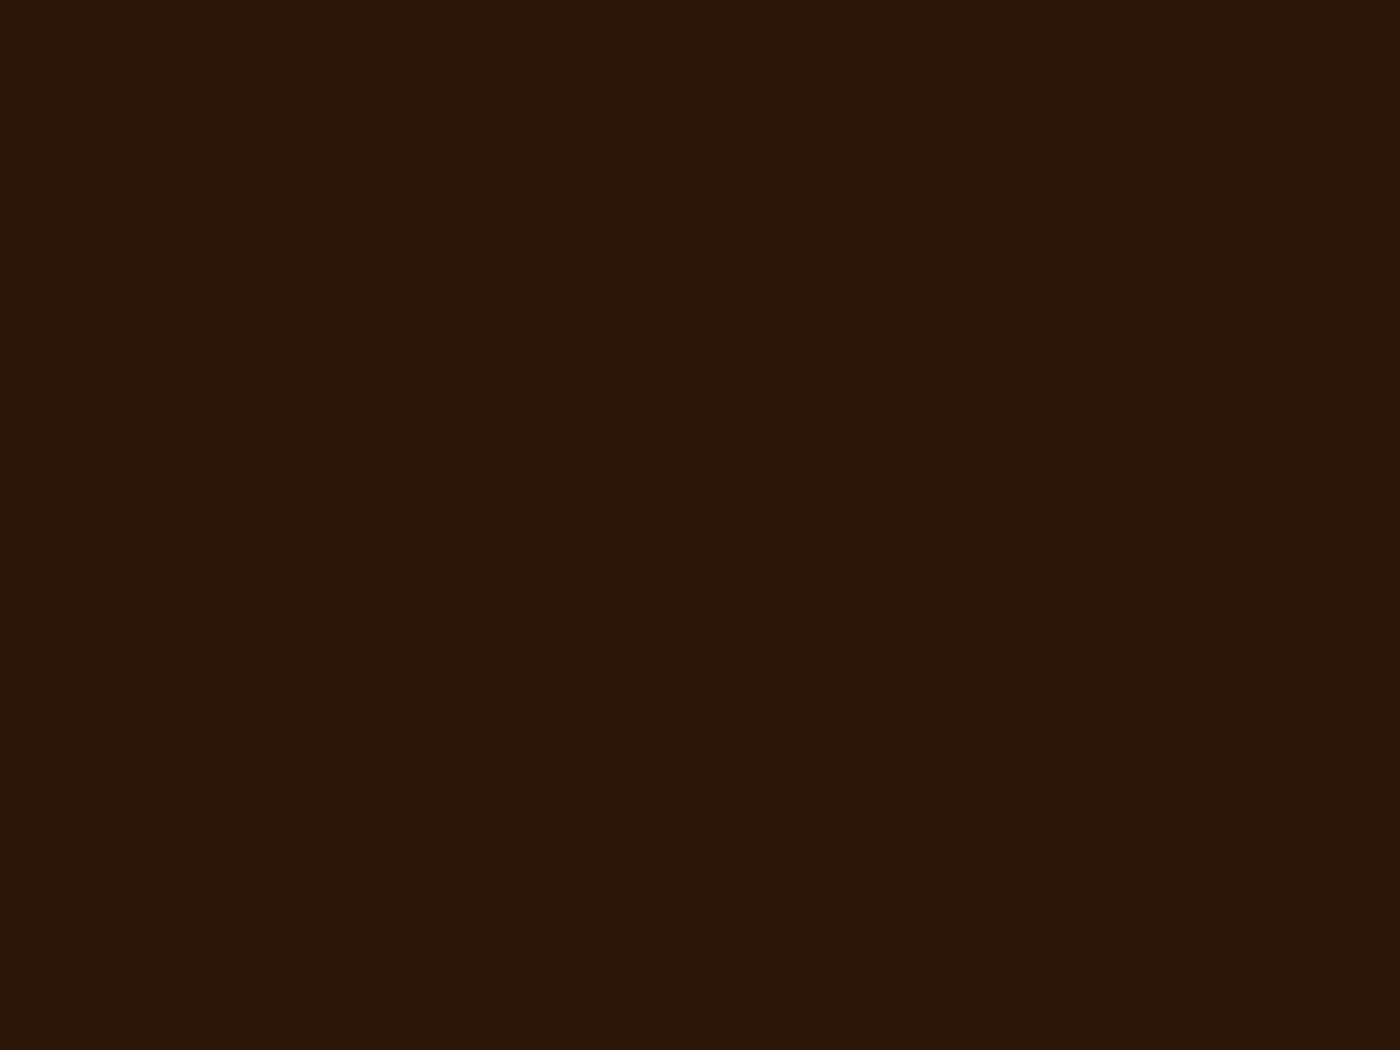 1400x1050 Zinnwaldite Brown Solid Color Background